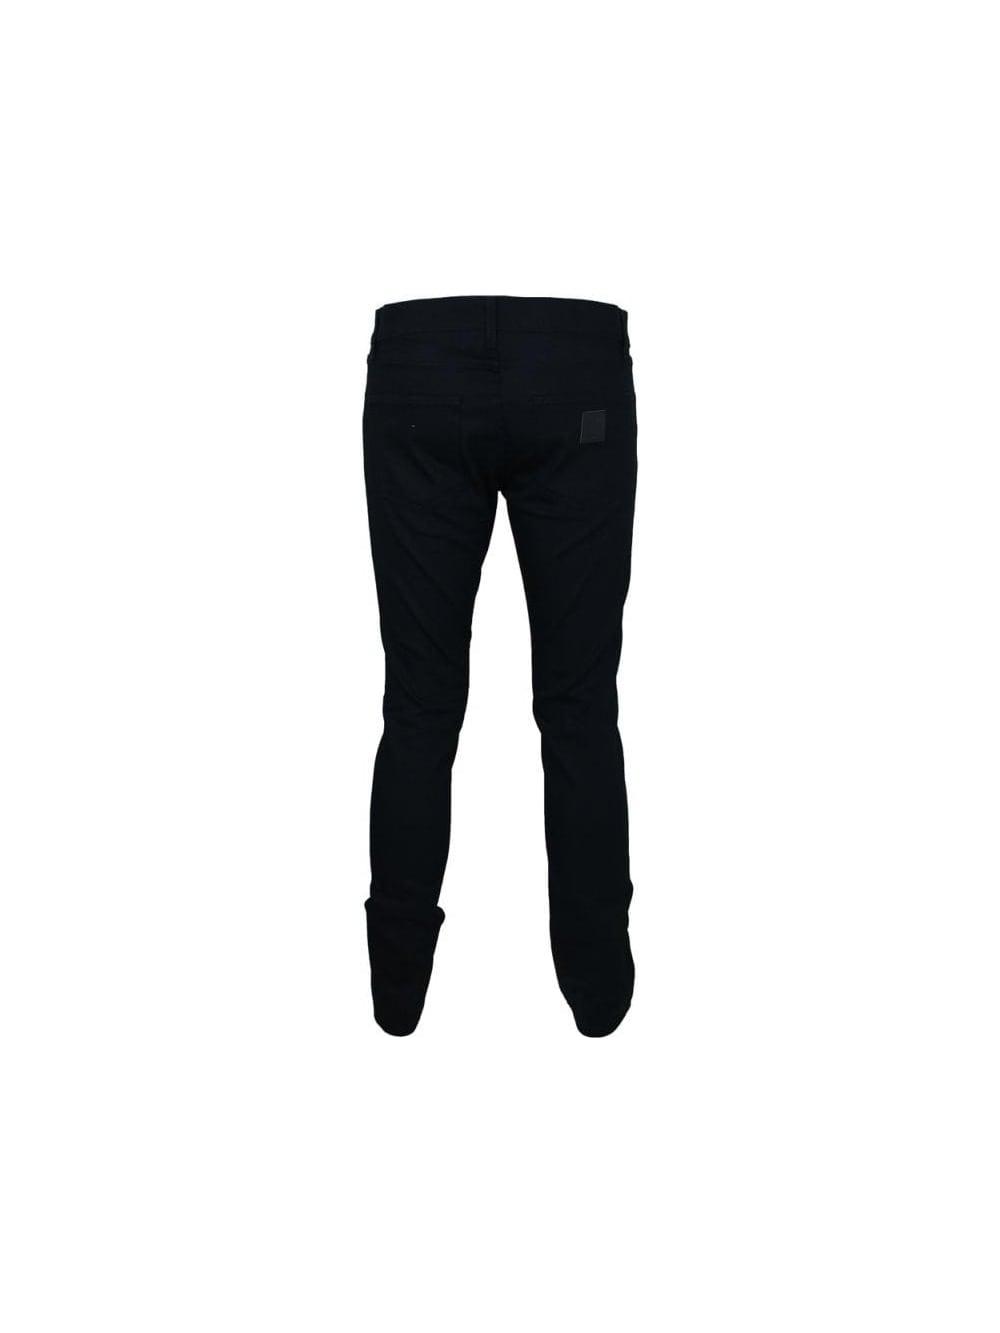 c55d36ce Carhartt Rebel Pant in Black Rigid - Northern Threads